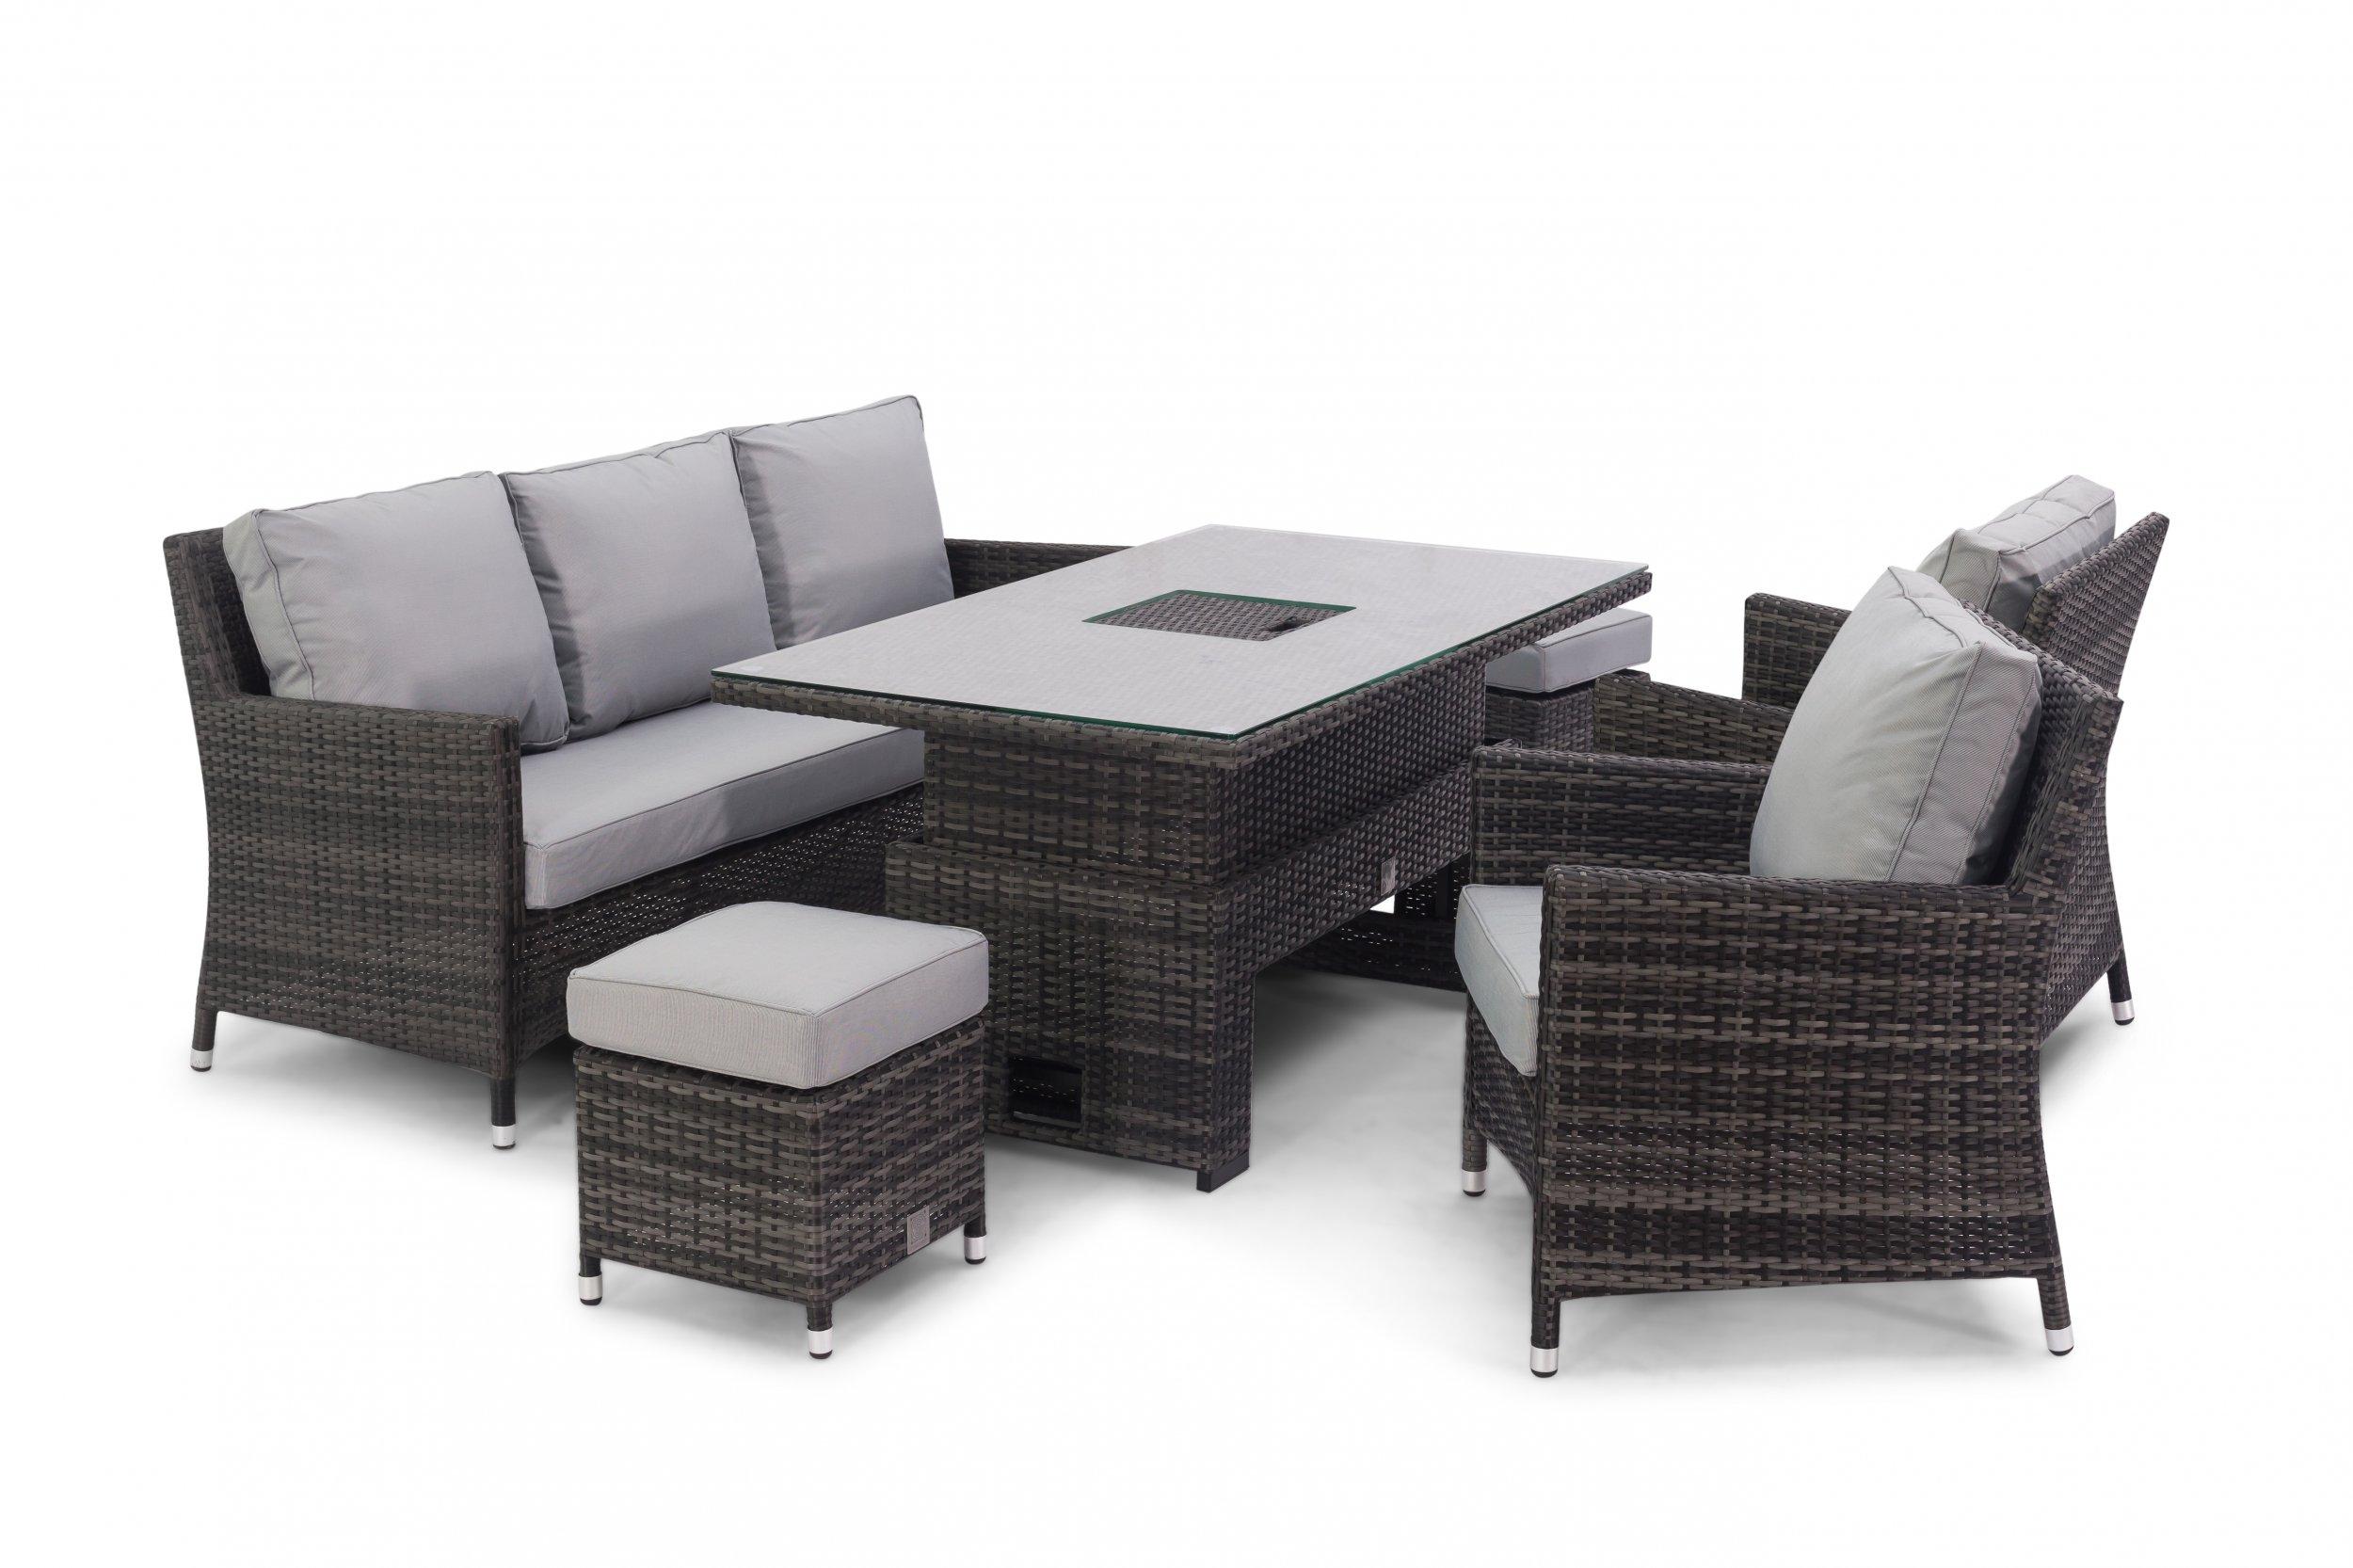 Maze Rattan Venice Sofa Dining Set With Dual Position